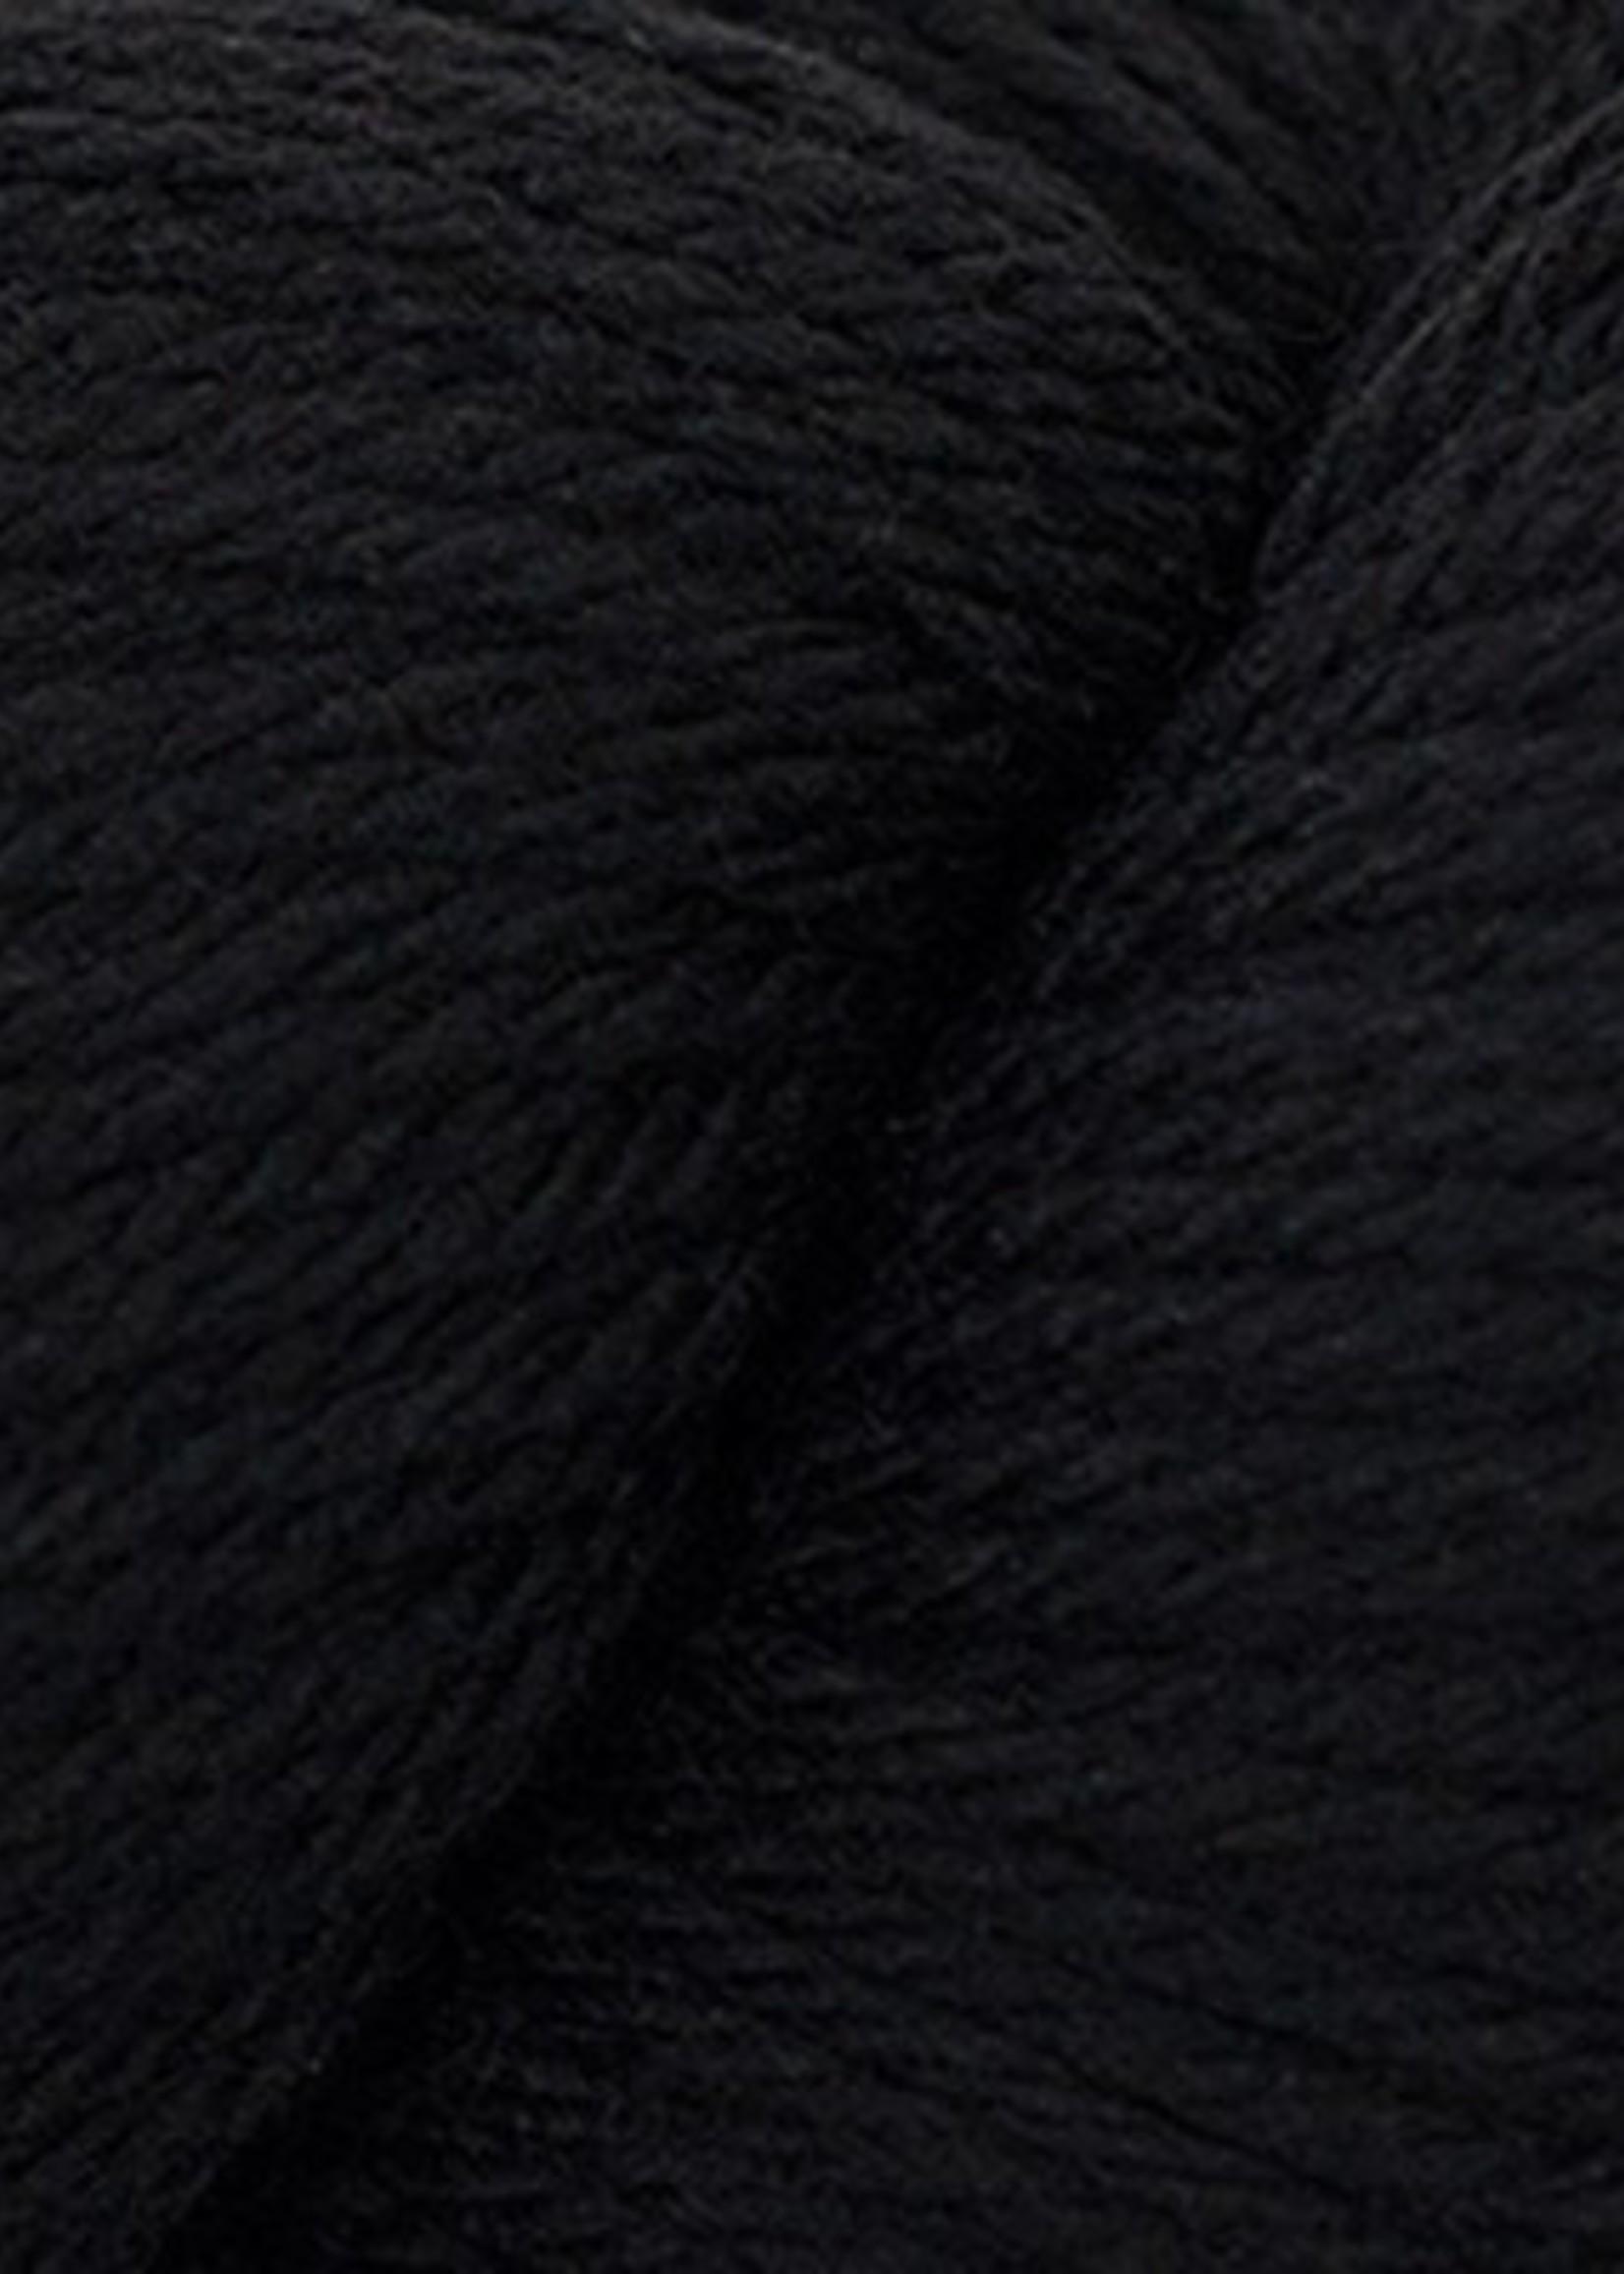 Cascade Cascade 220 Yarn #8555 Black